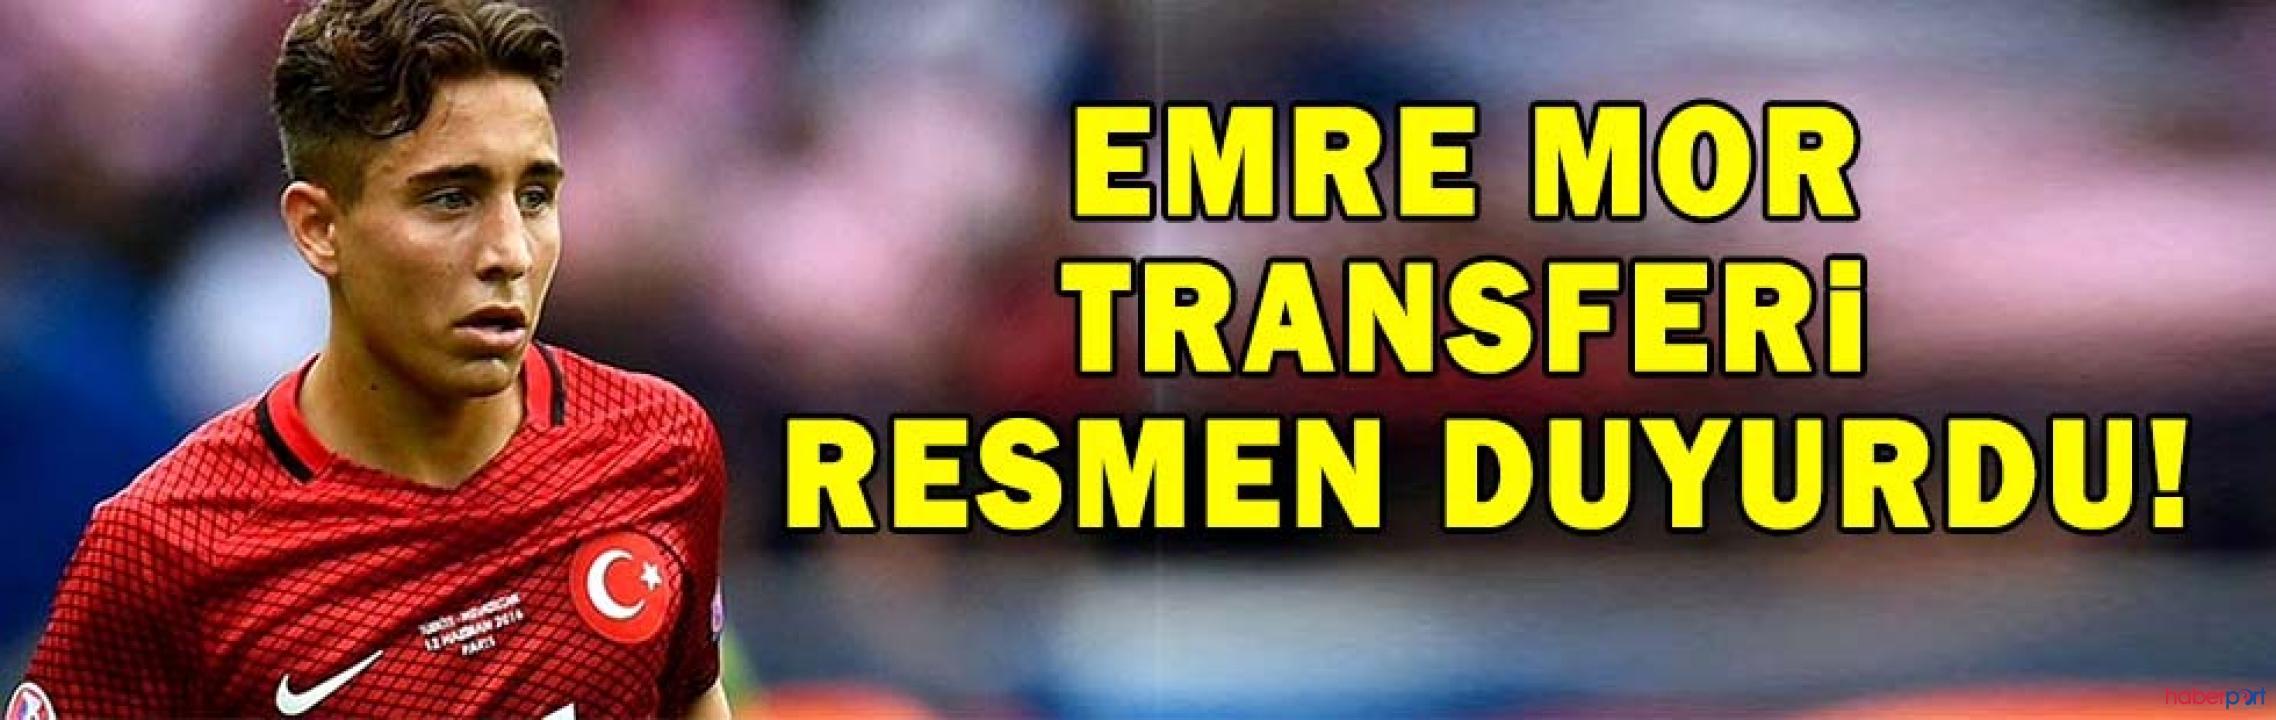 Olympiakos Transferi duyurdu